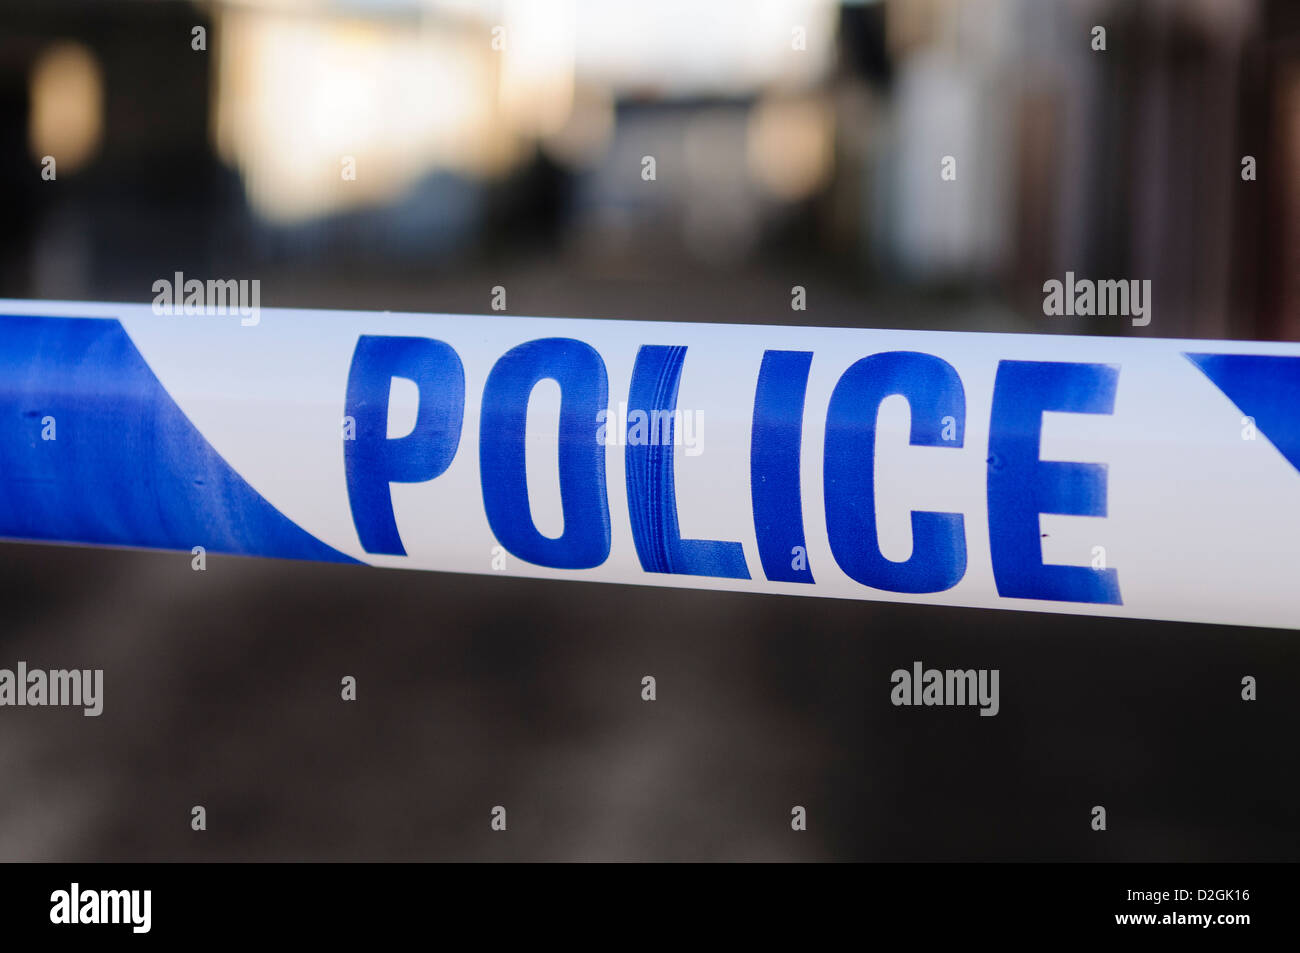 Police tape at the cordon across a crime scene - Stock Image